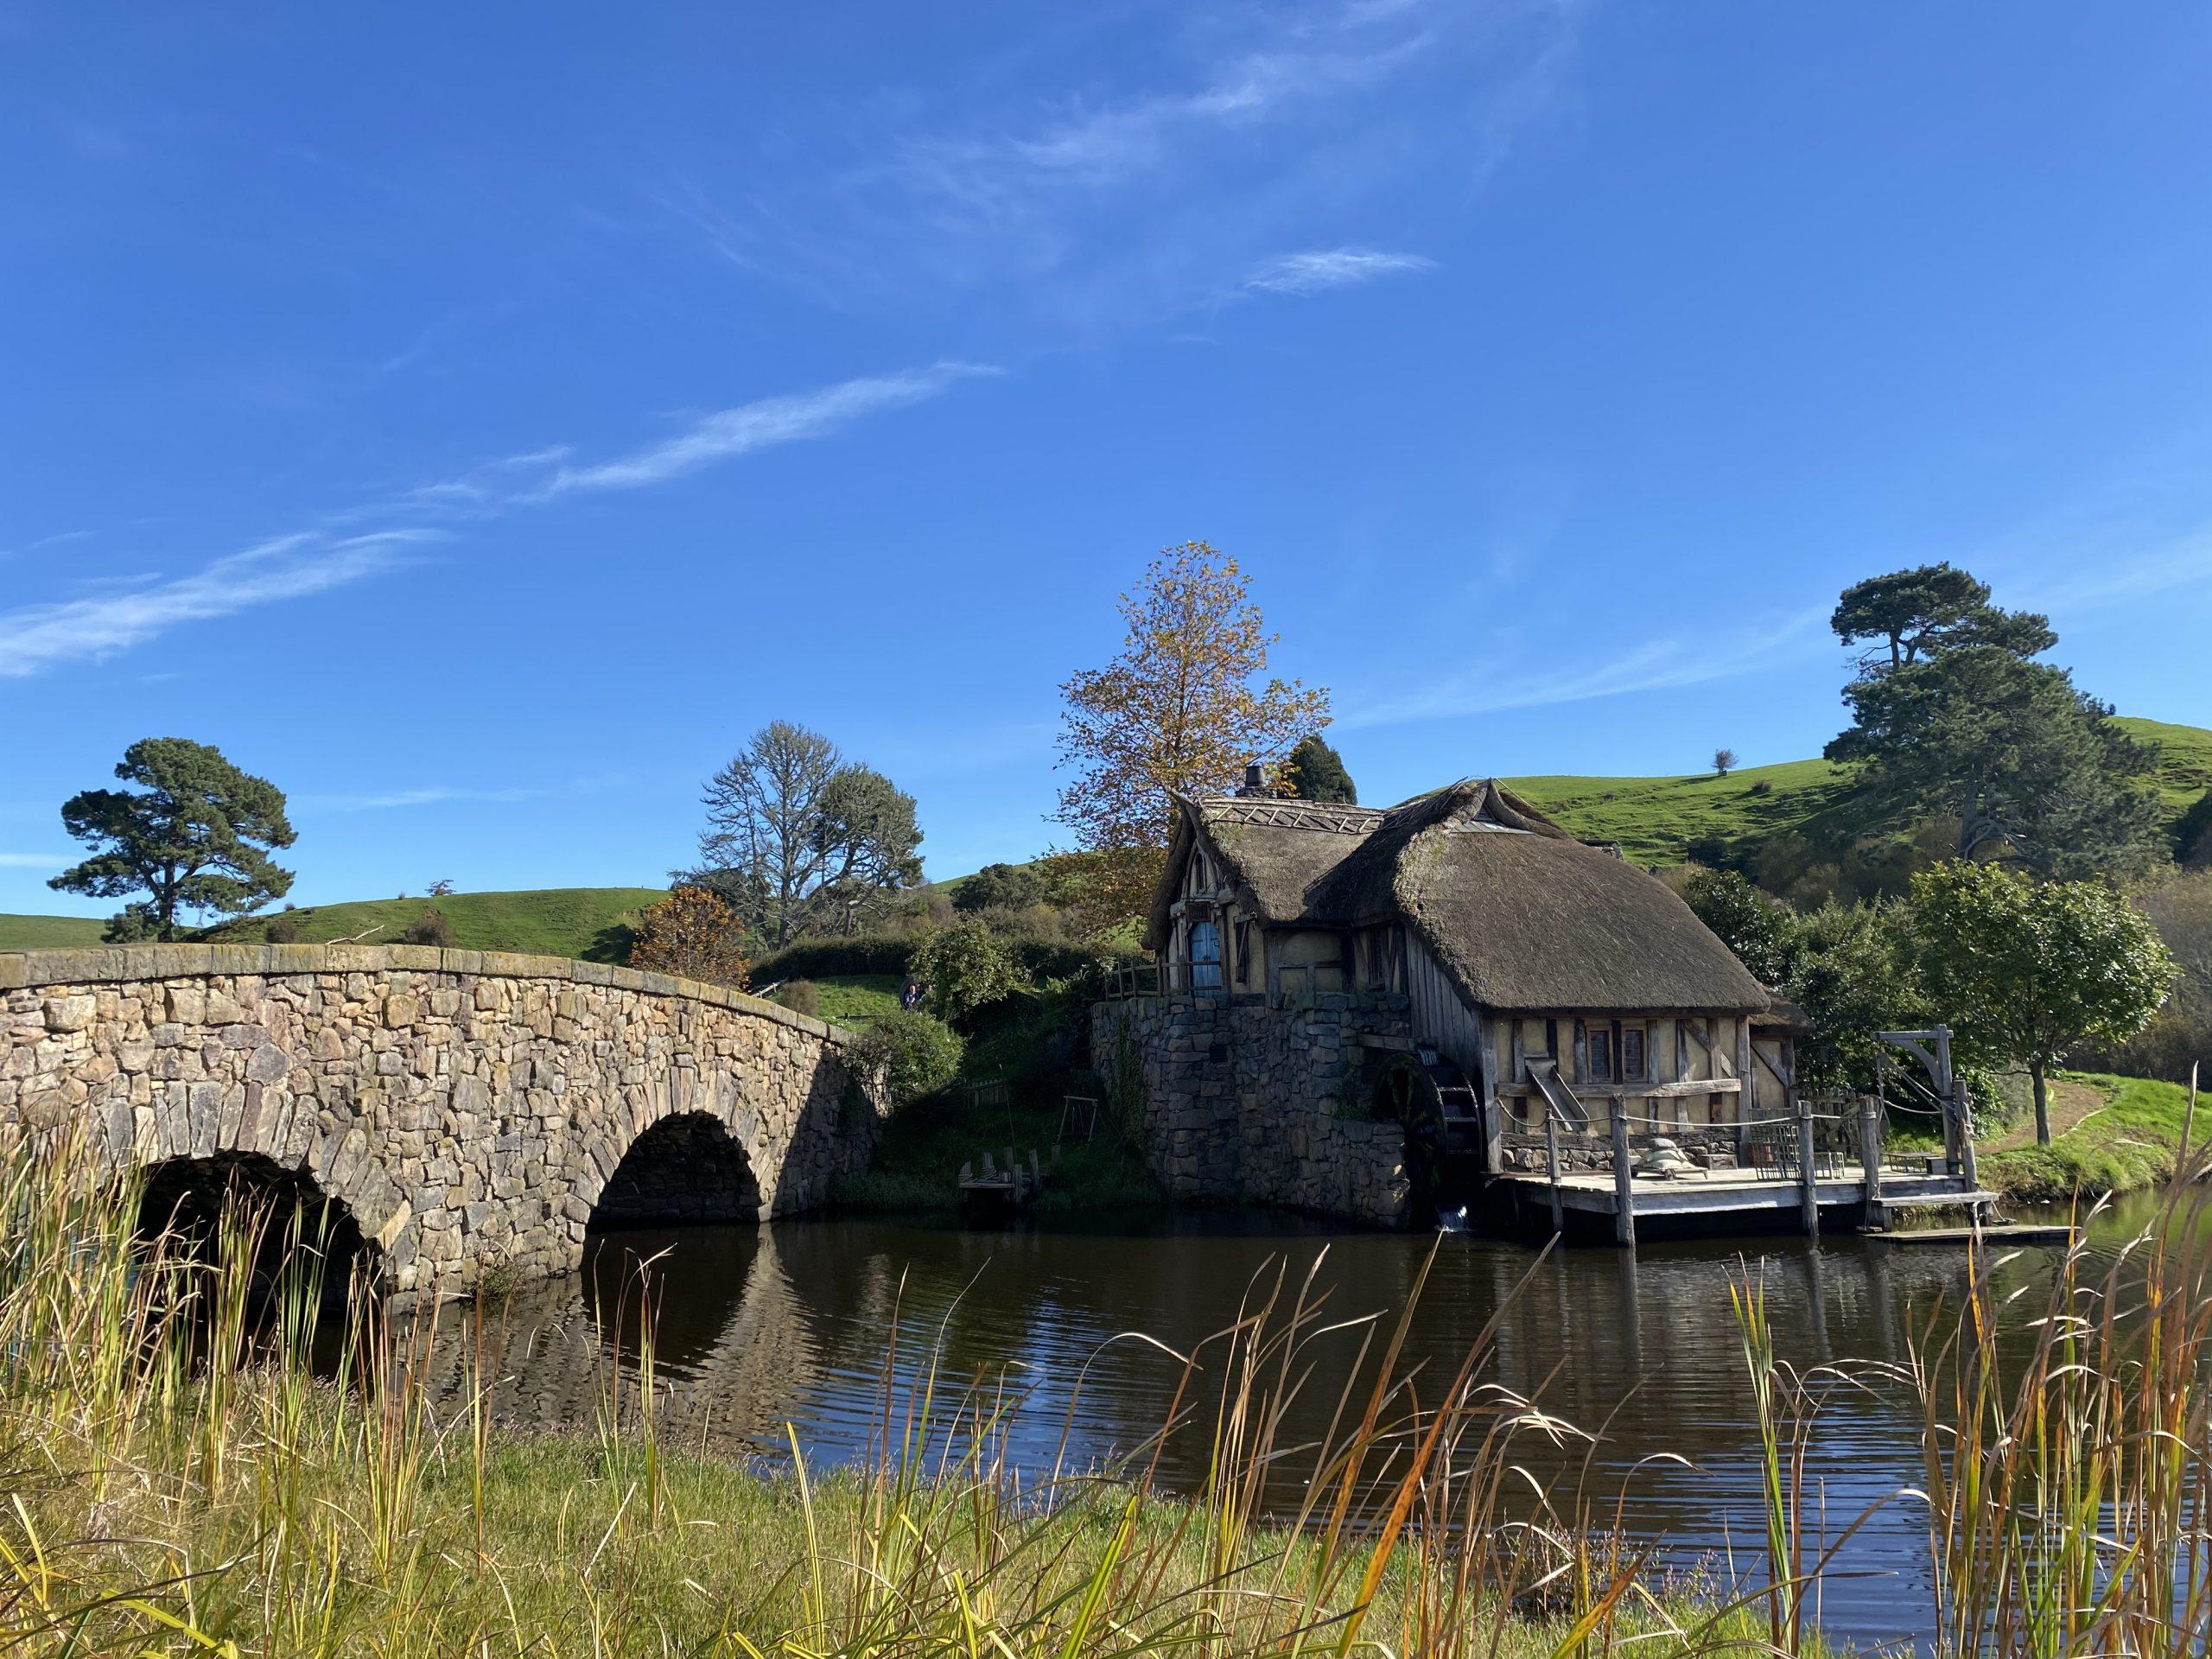 The Mill, Bridge & Millpond at Hobbiton Movie Set